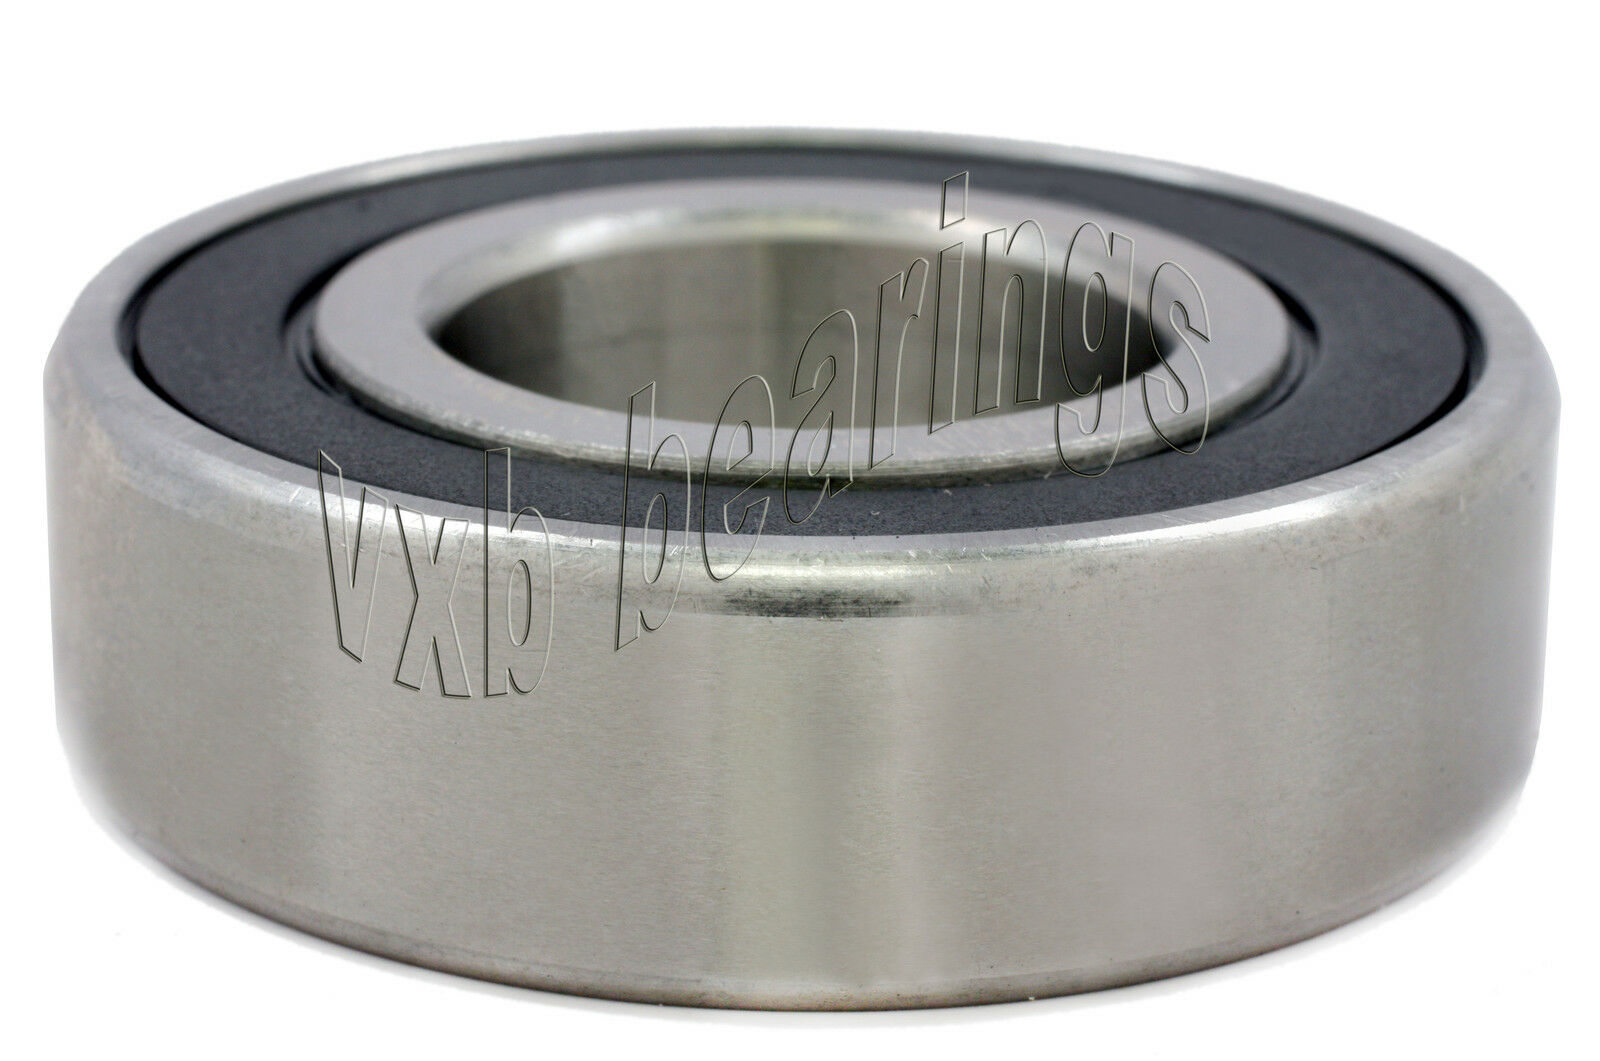 6200-2RS AB Alternator Bearing 10x30x9 Sealed Ball Bearings 17229